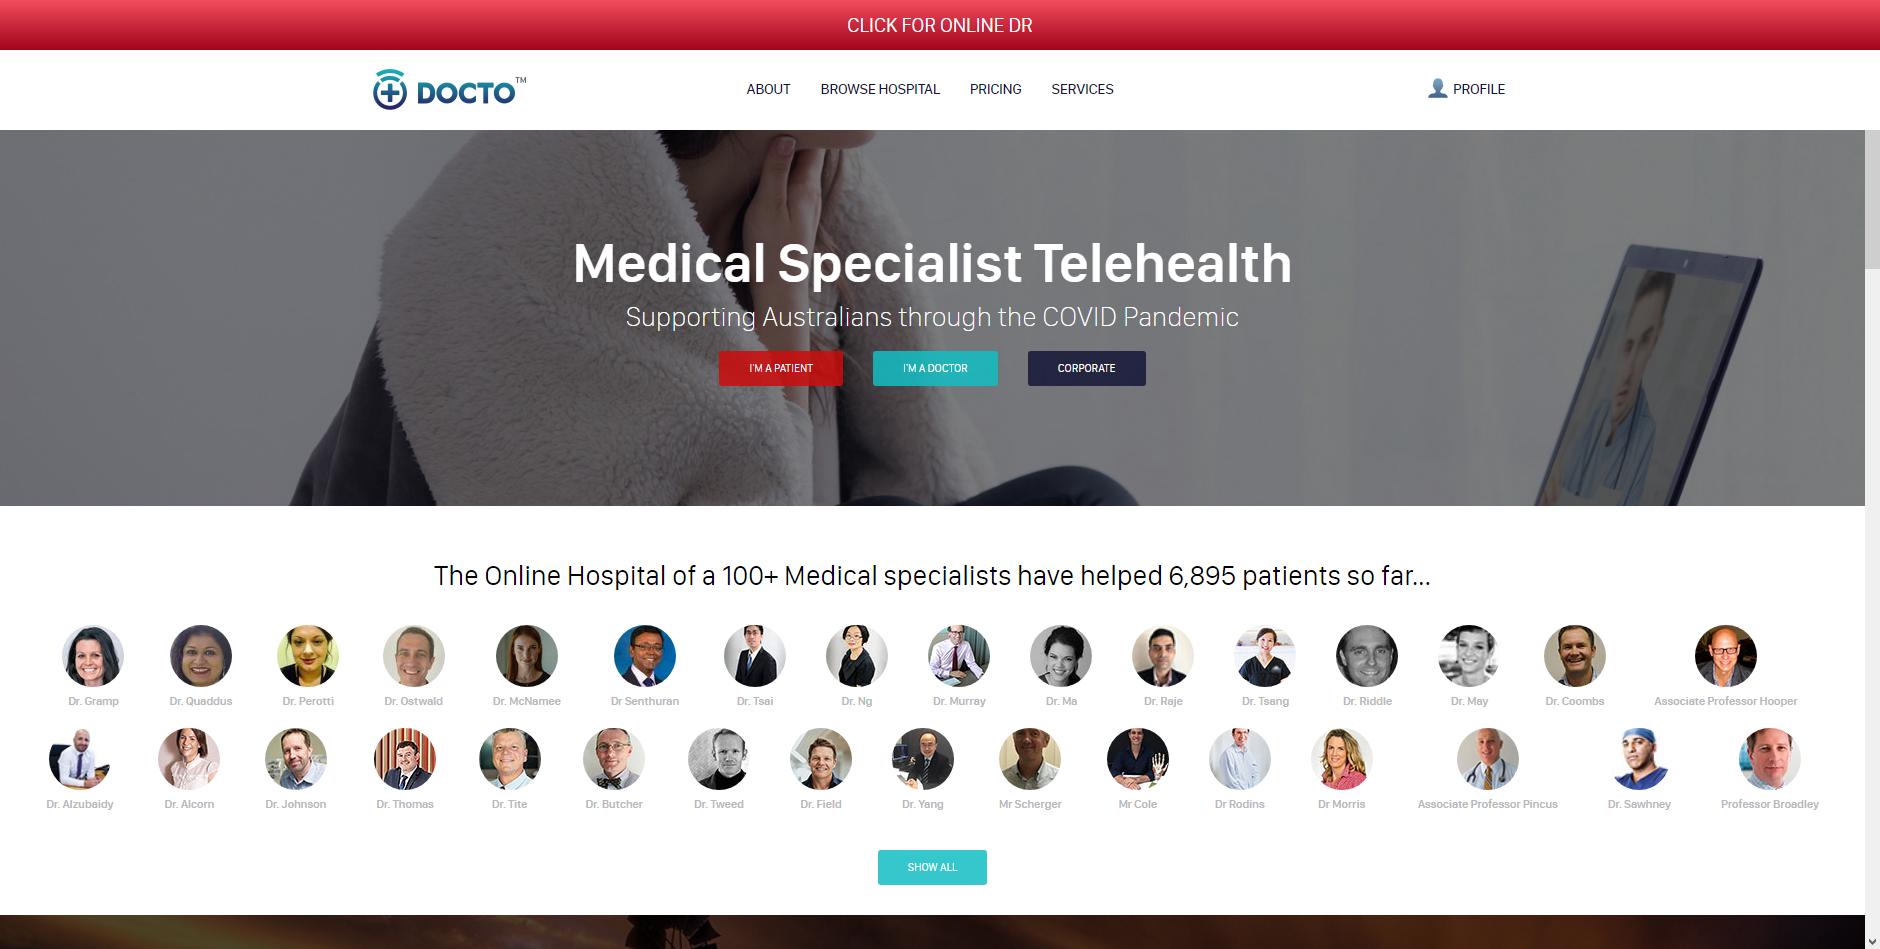 Docto.com.au Australias Best Online Doctor